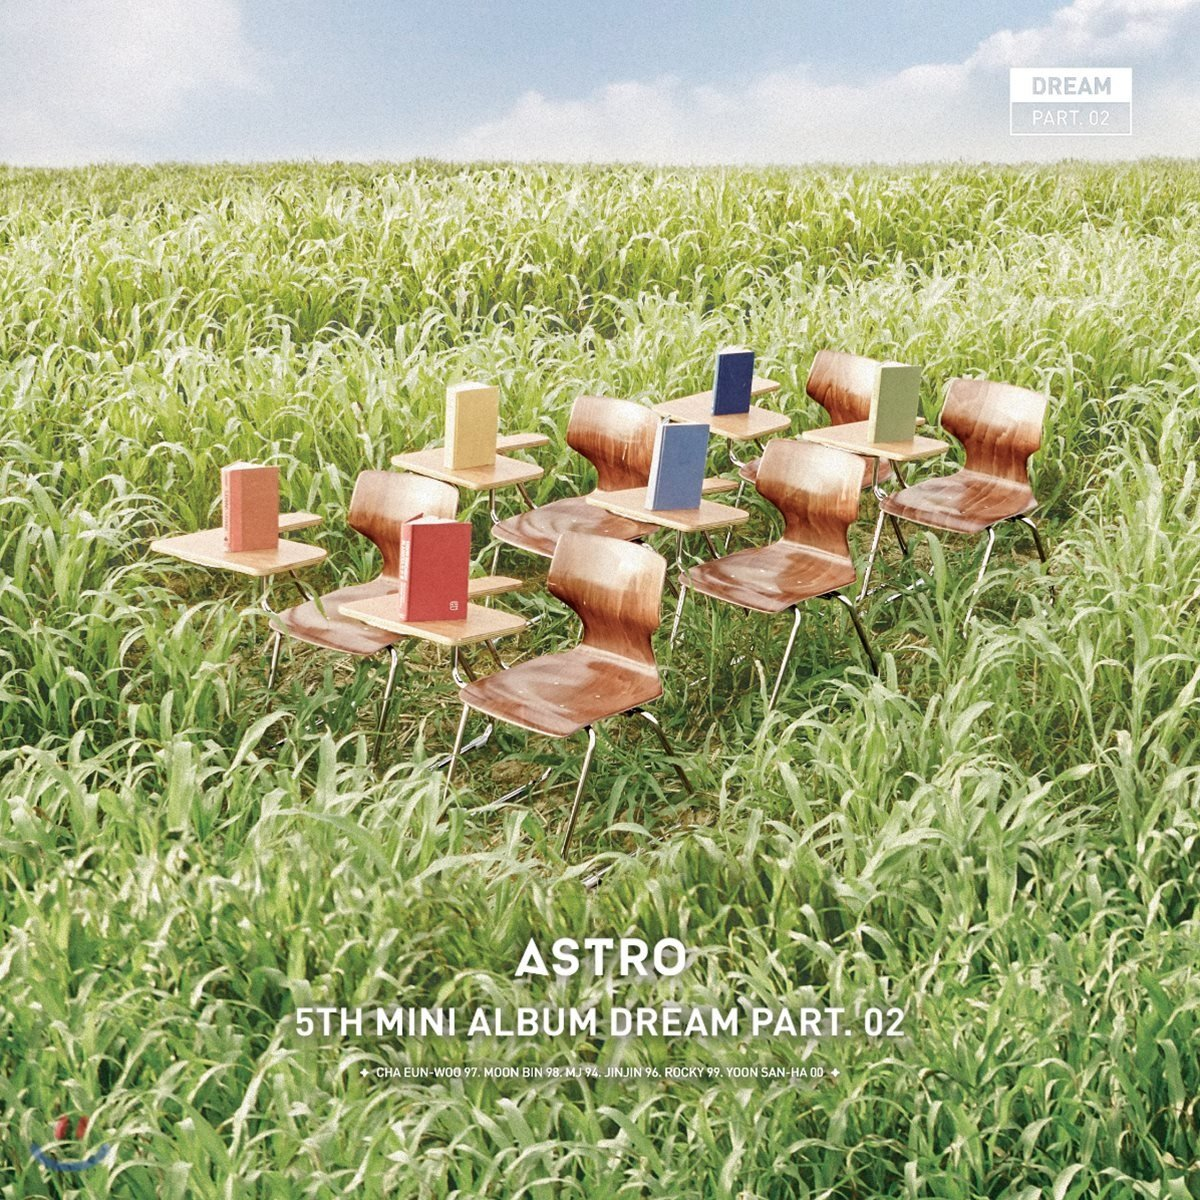 Astro 5th Mini Album DREAM Part.02 [Wind Ver] + Folded Poster + Booklet + Post Card + Photo Card + Polaroid Photo + Special Card